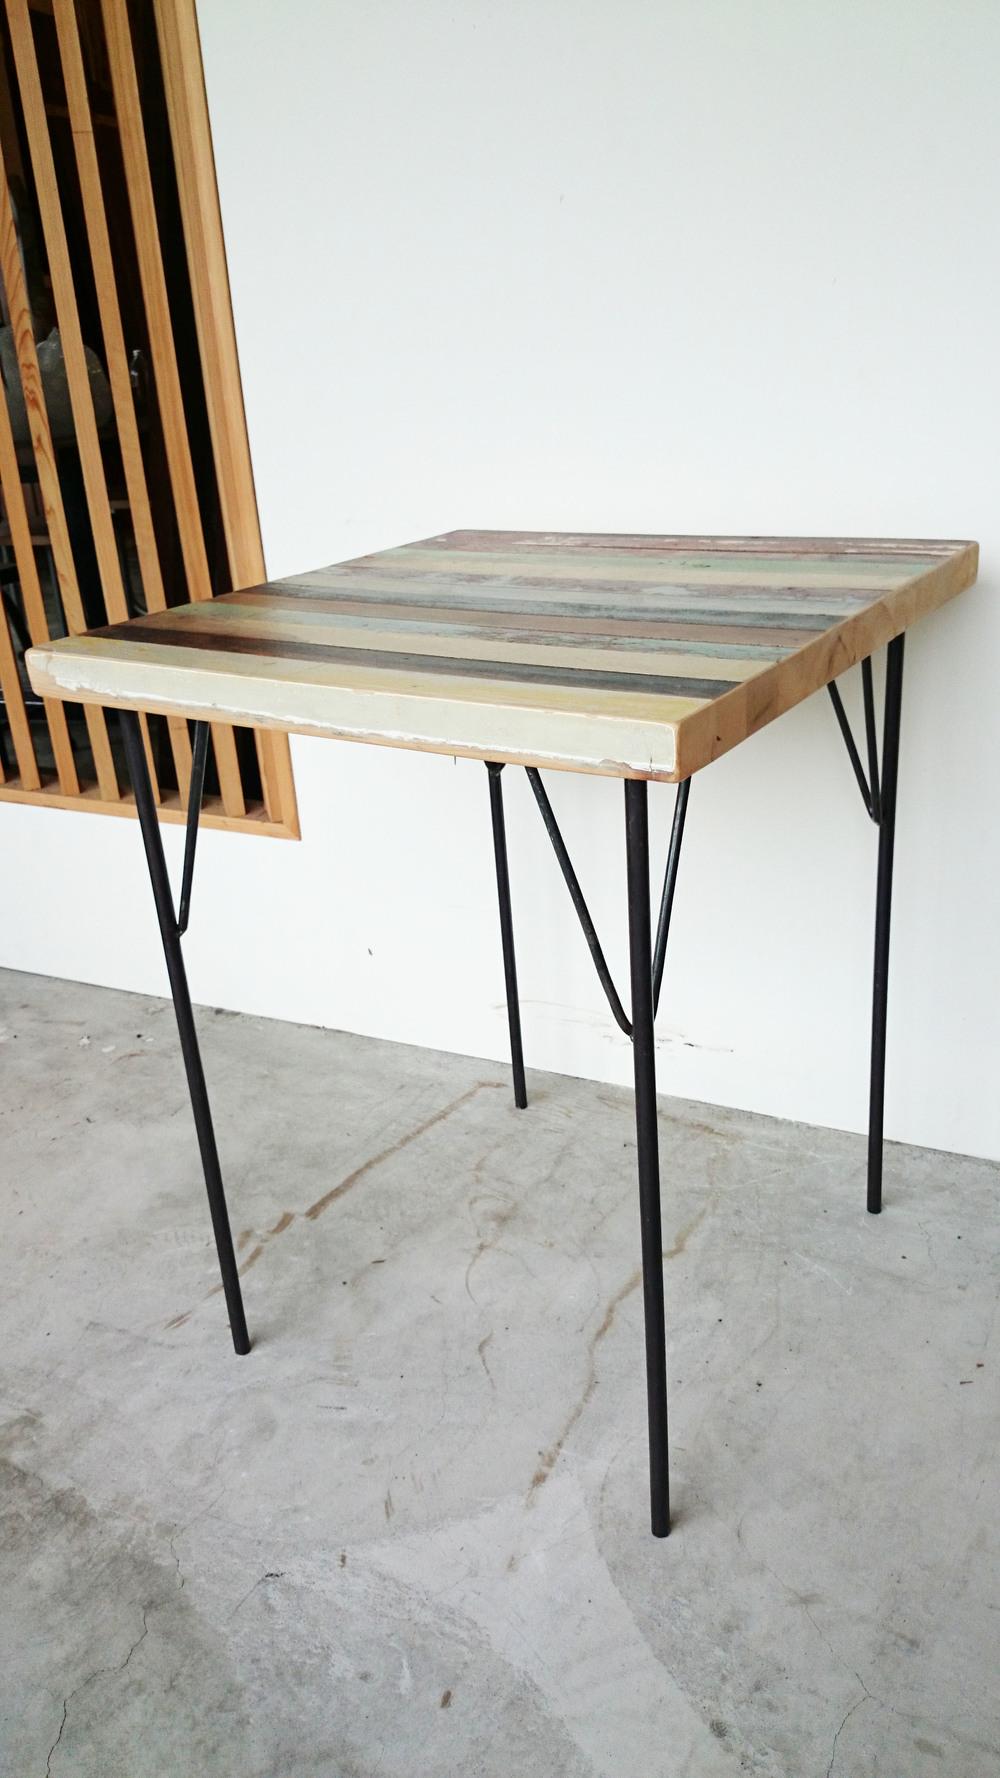 TS-I-04 Coffee table 實心黑鐵 x 台灣檜木(此腳停產)  NT 10,300 (未稅)